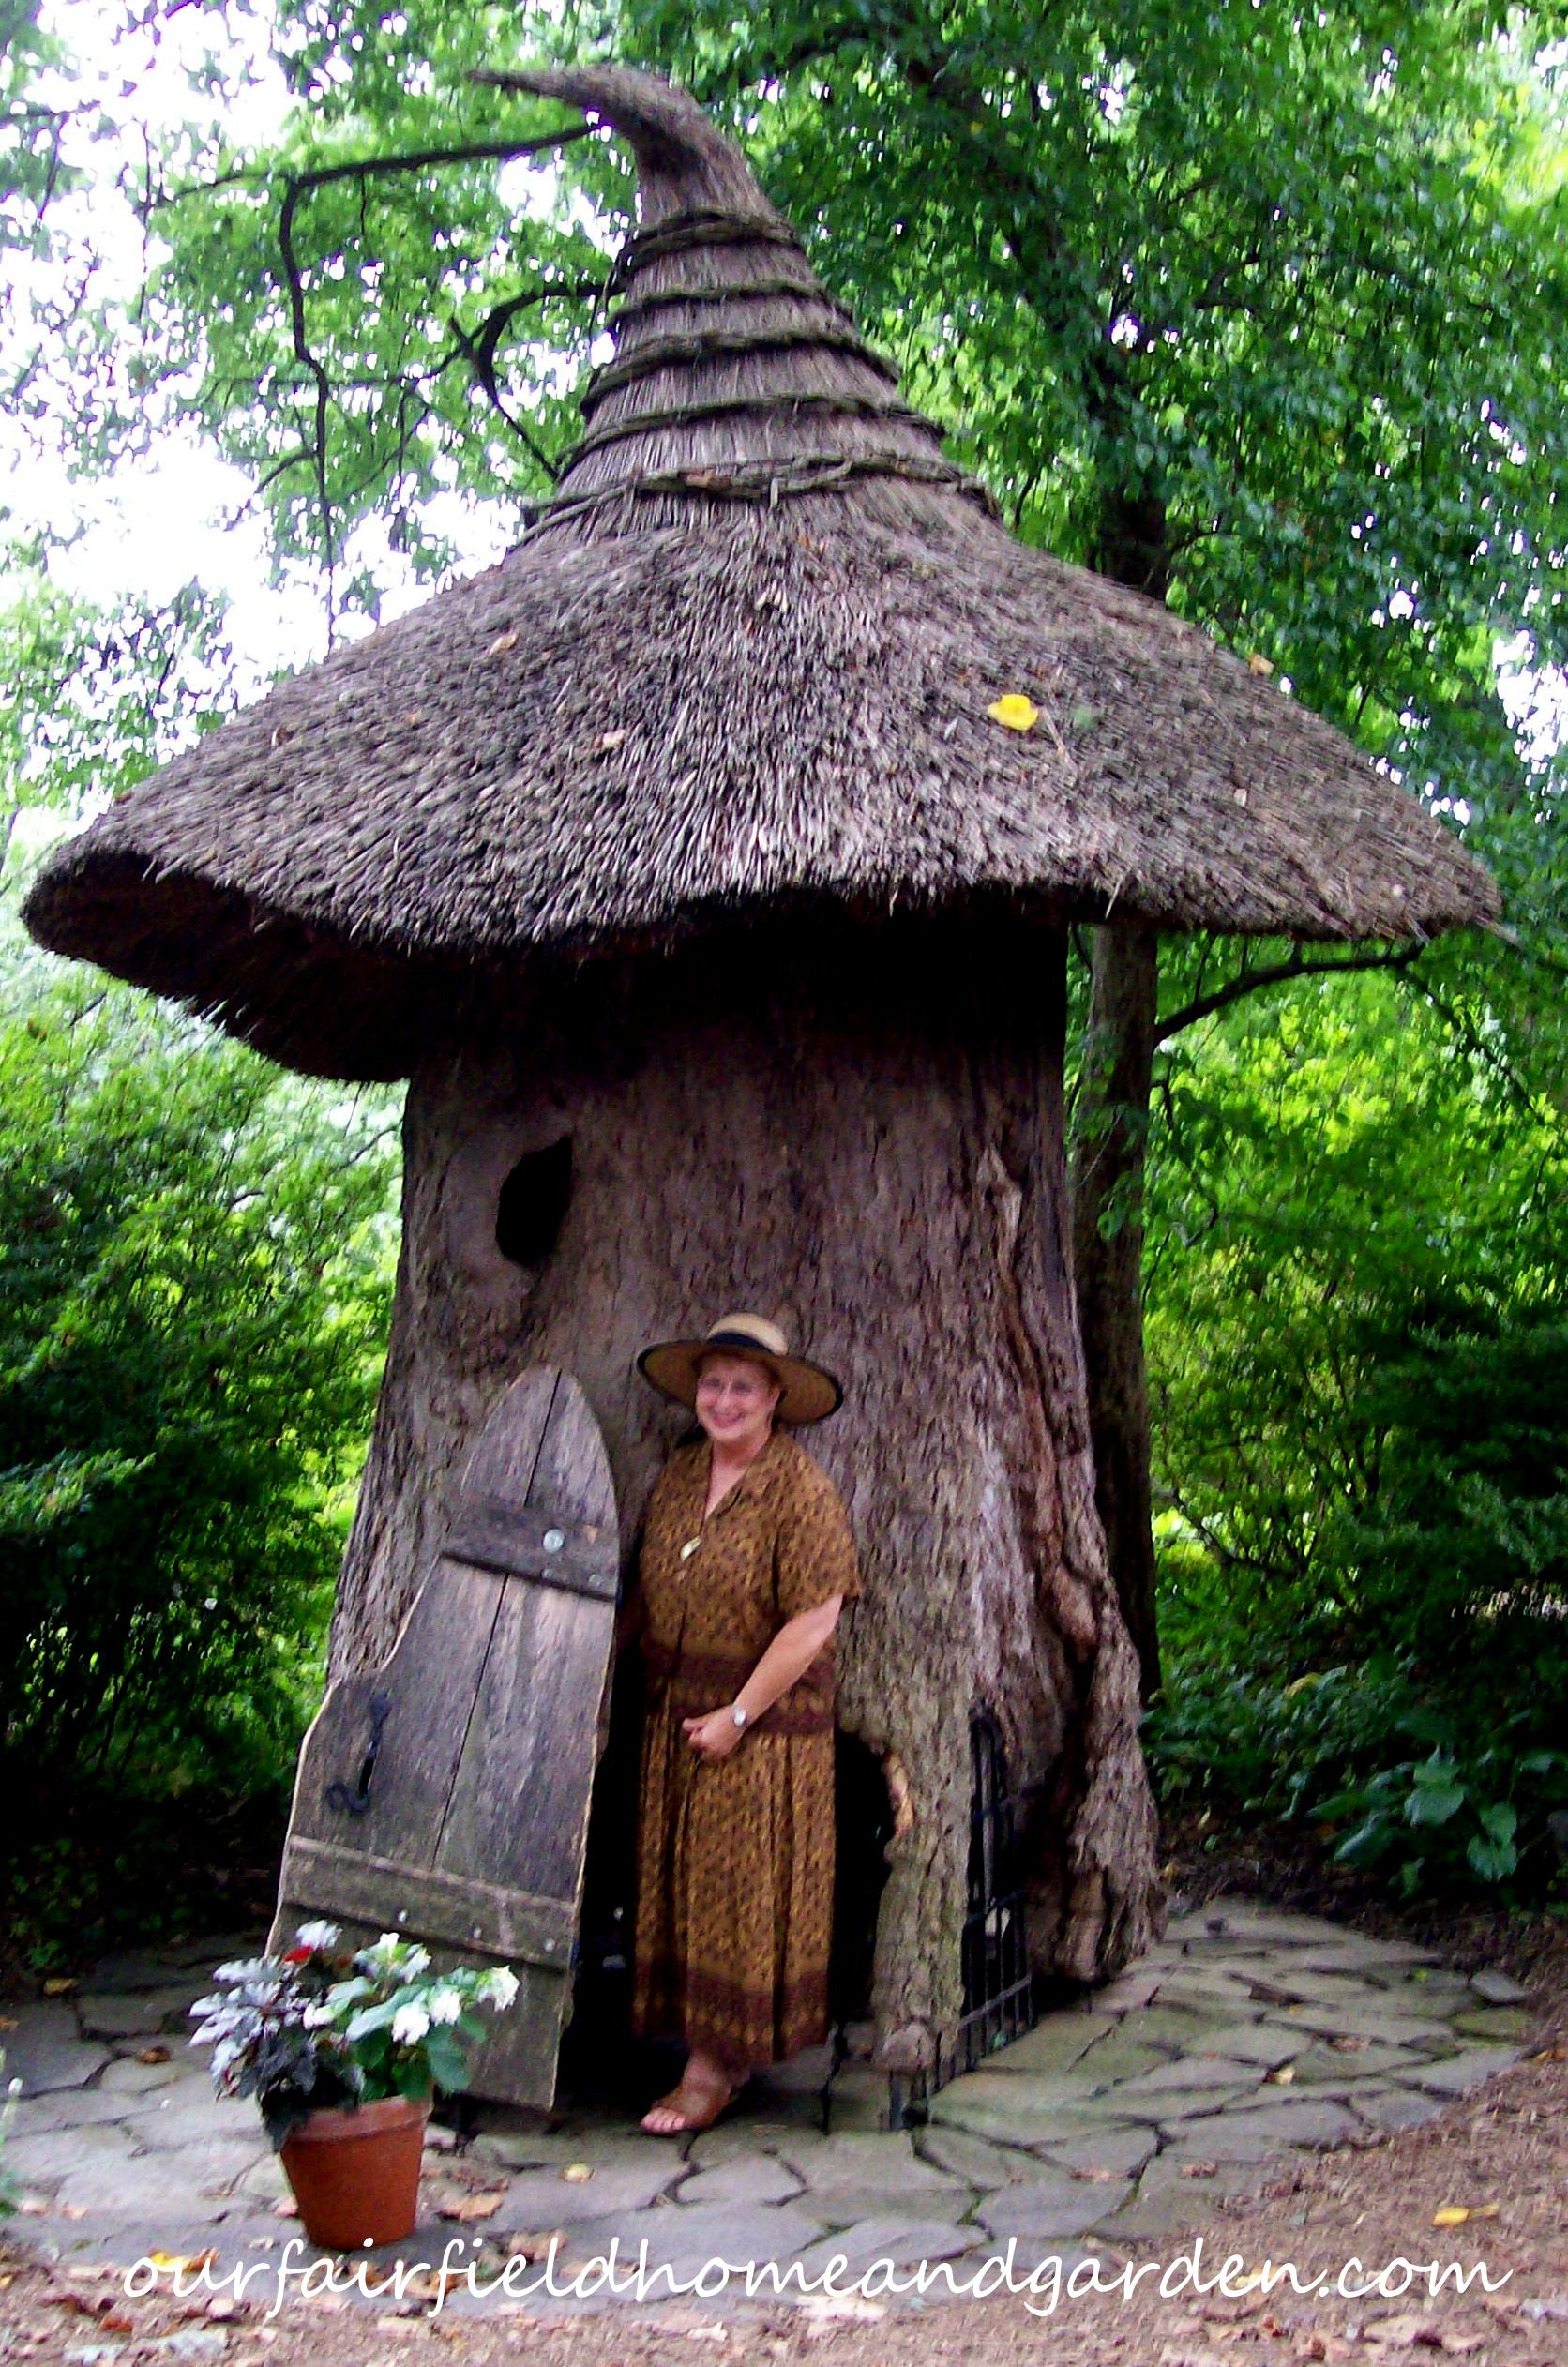 Enchanted Garden: Field Trip: Winterthur's Faerie Garden At Enchanted Woods